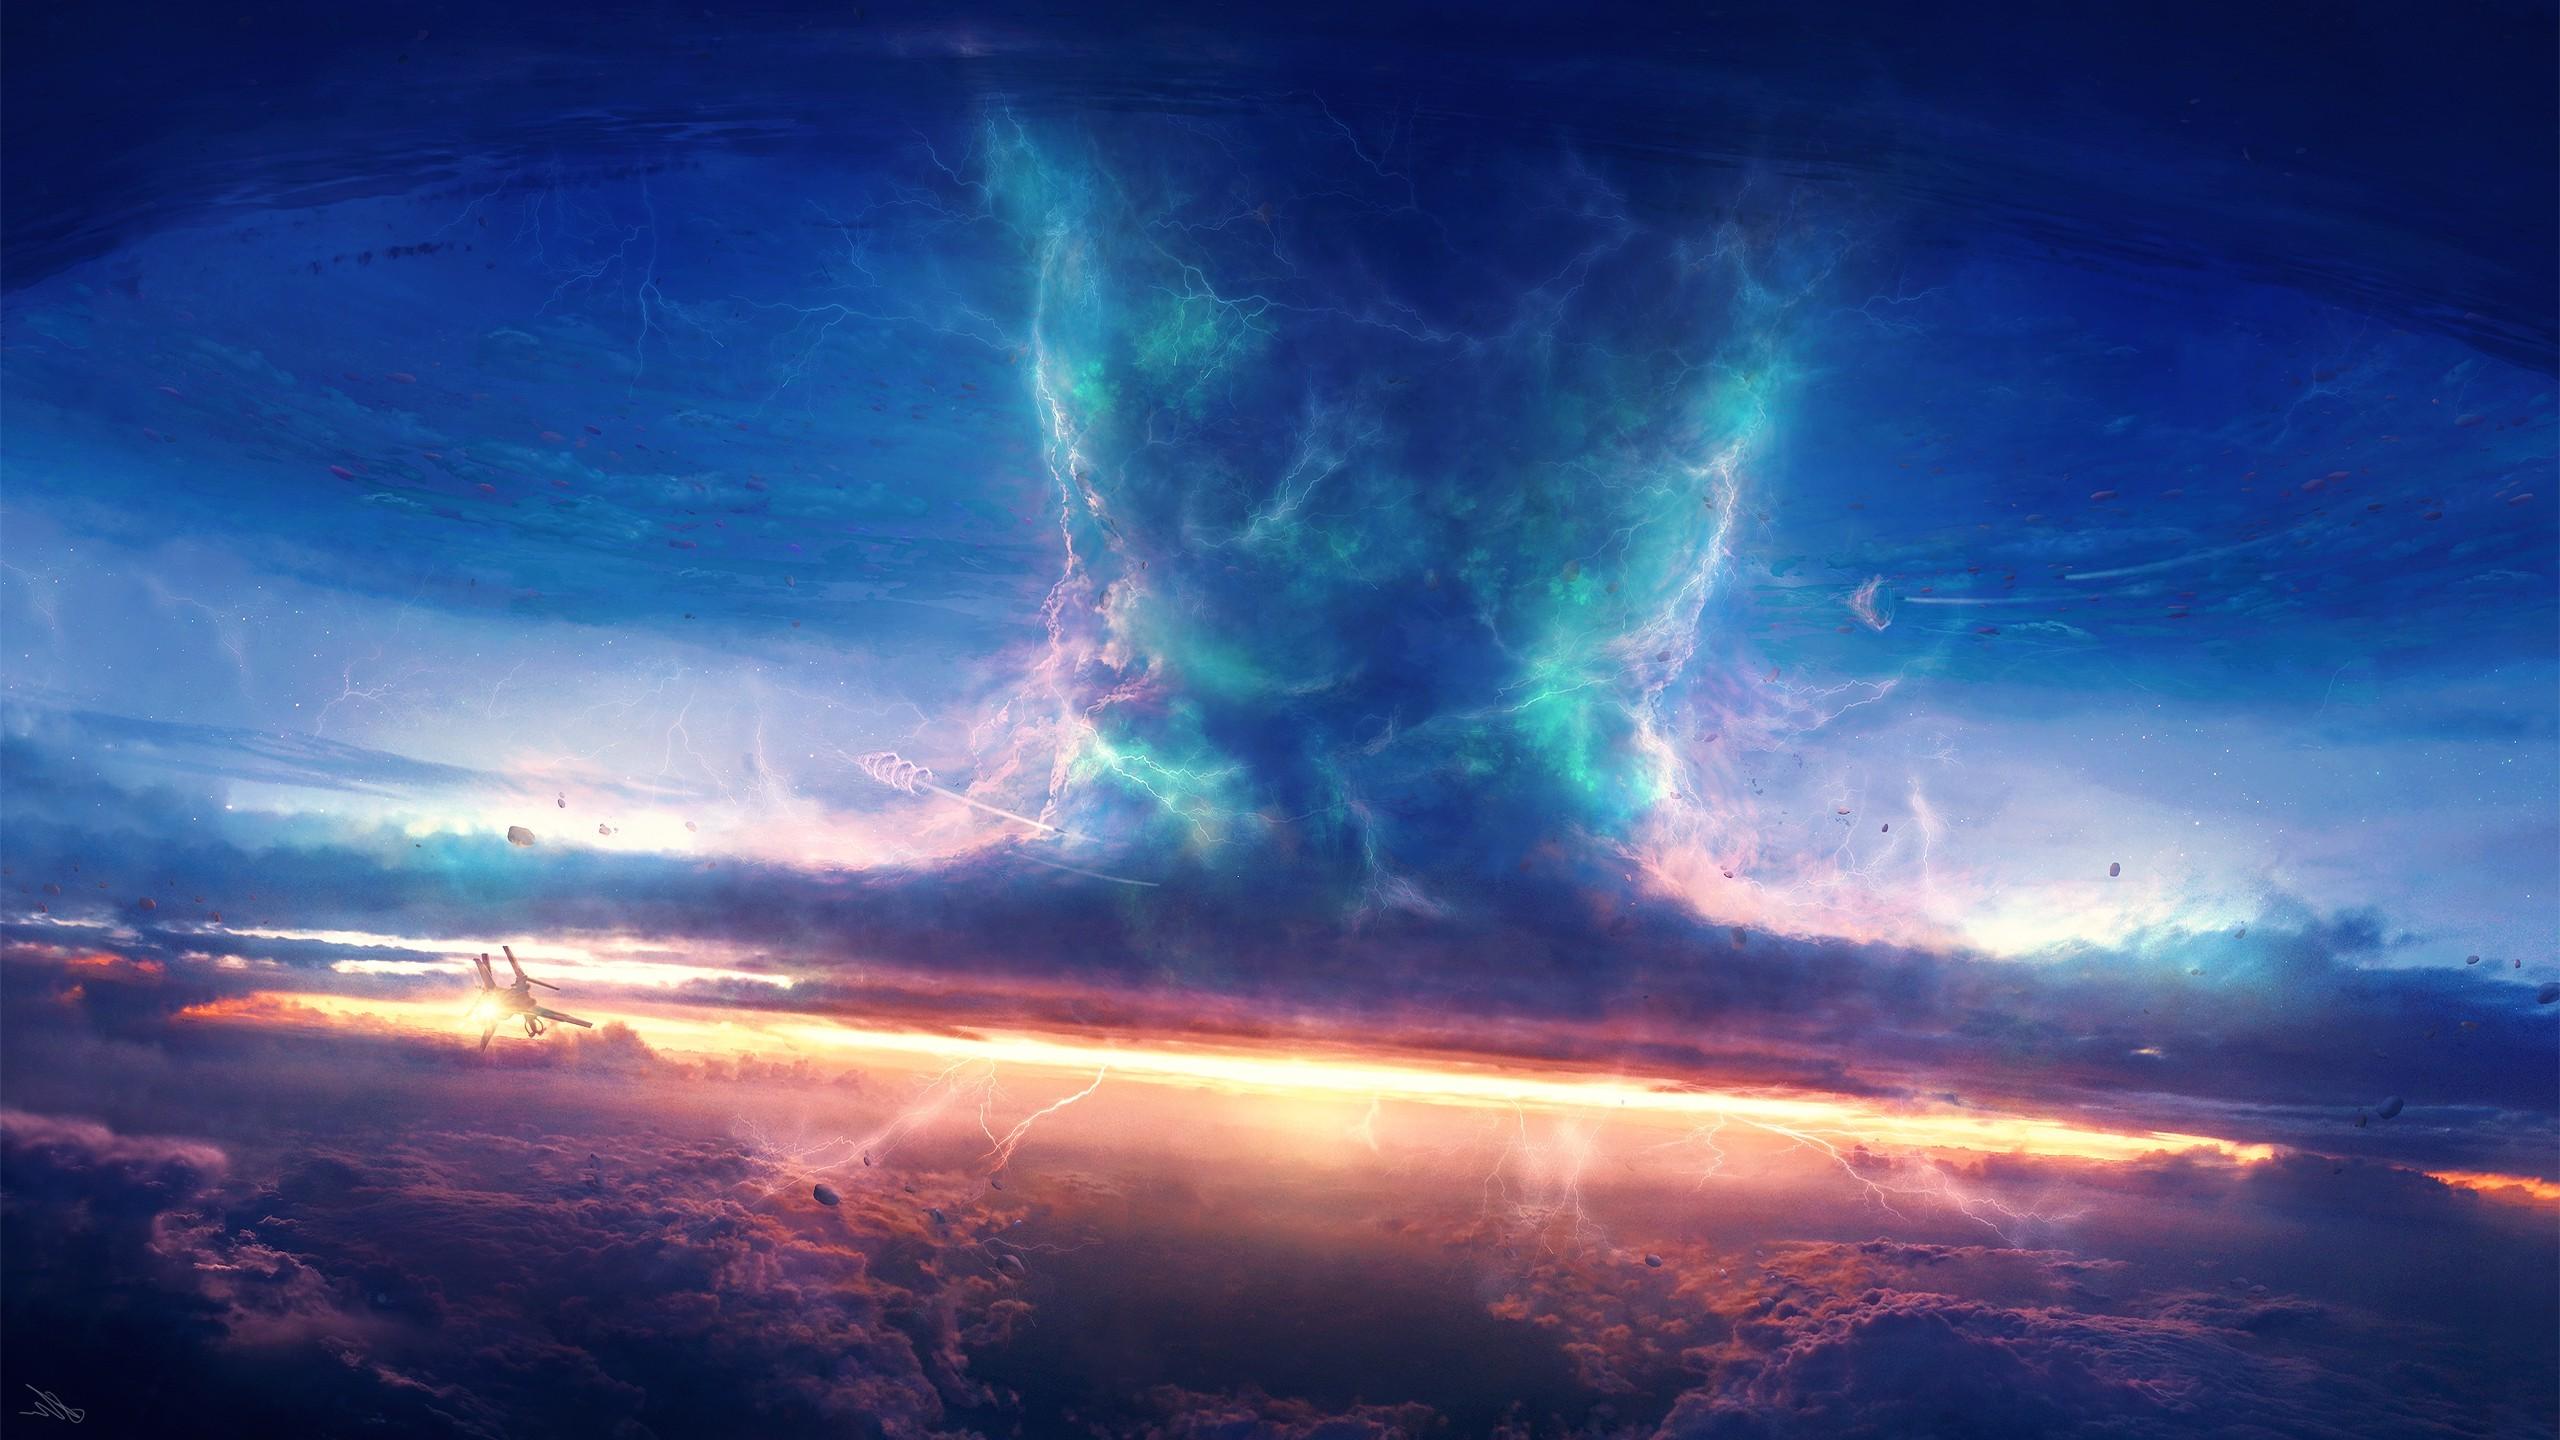 Sunlight Sky DeviantArt Sunrise Atmosphere Tornado Thunder Cloud 2560x1440 Px Of Earth Outer Space